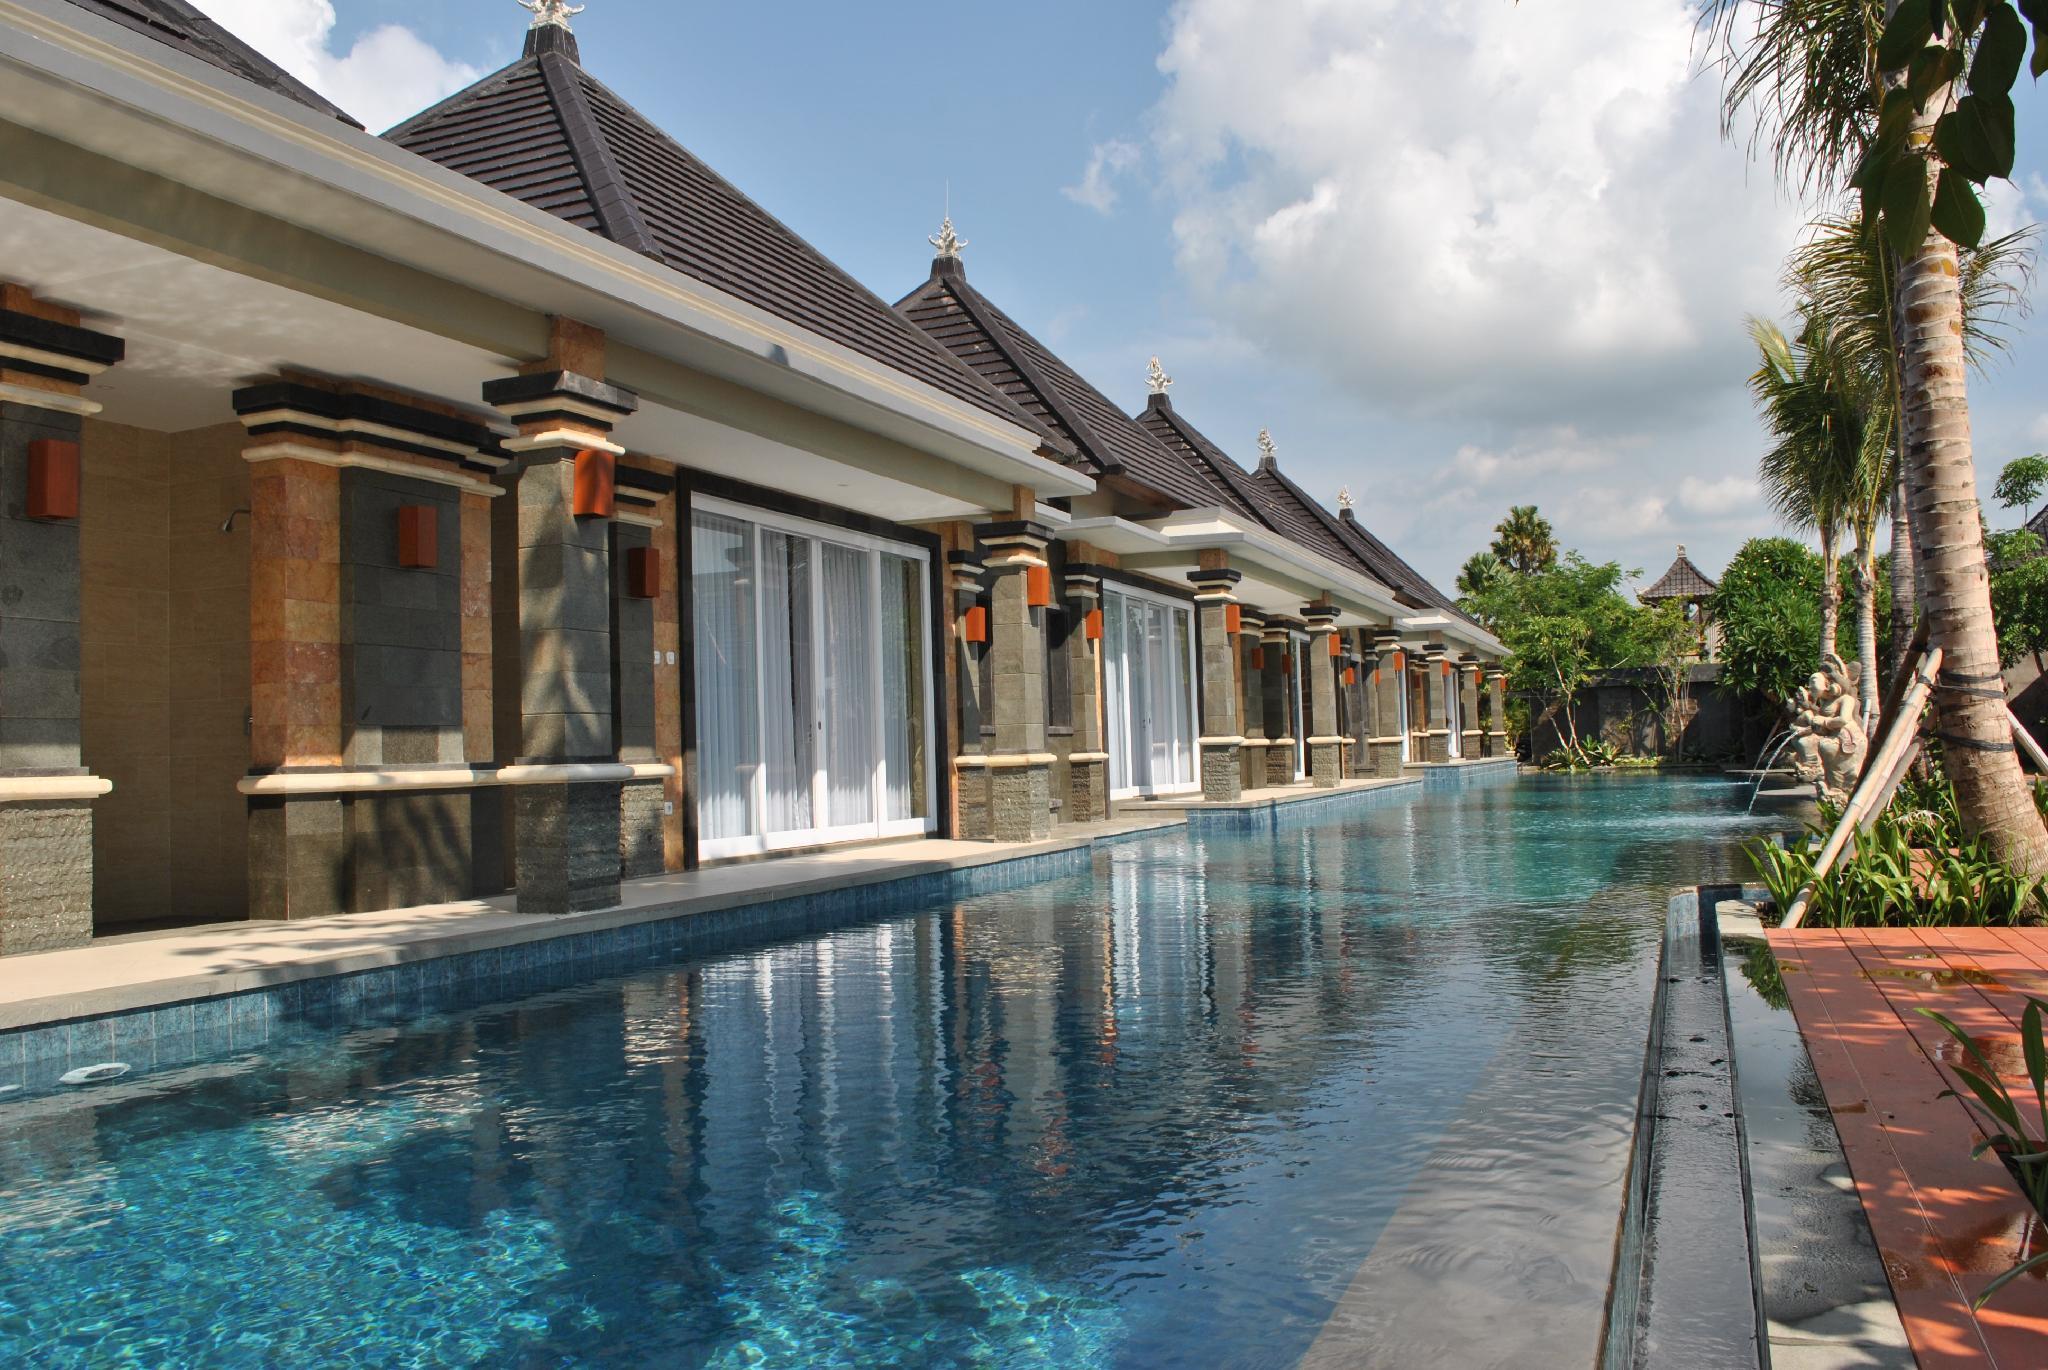 Kori Maharani Villas Bali Promo Terbaru 2020 Rp 406316 Foto Hd Ulasan